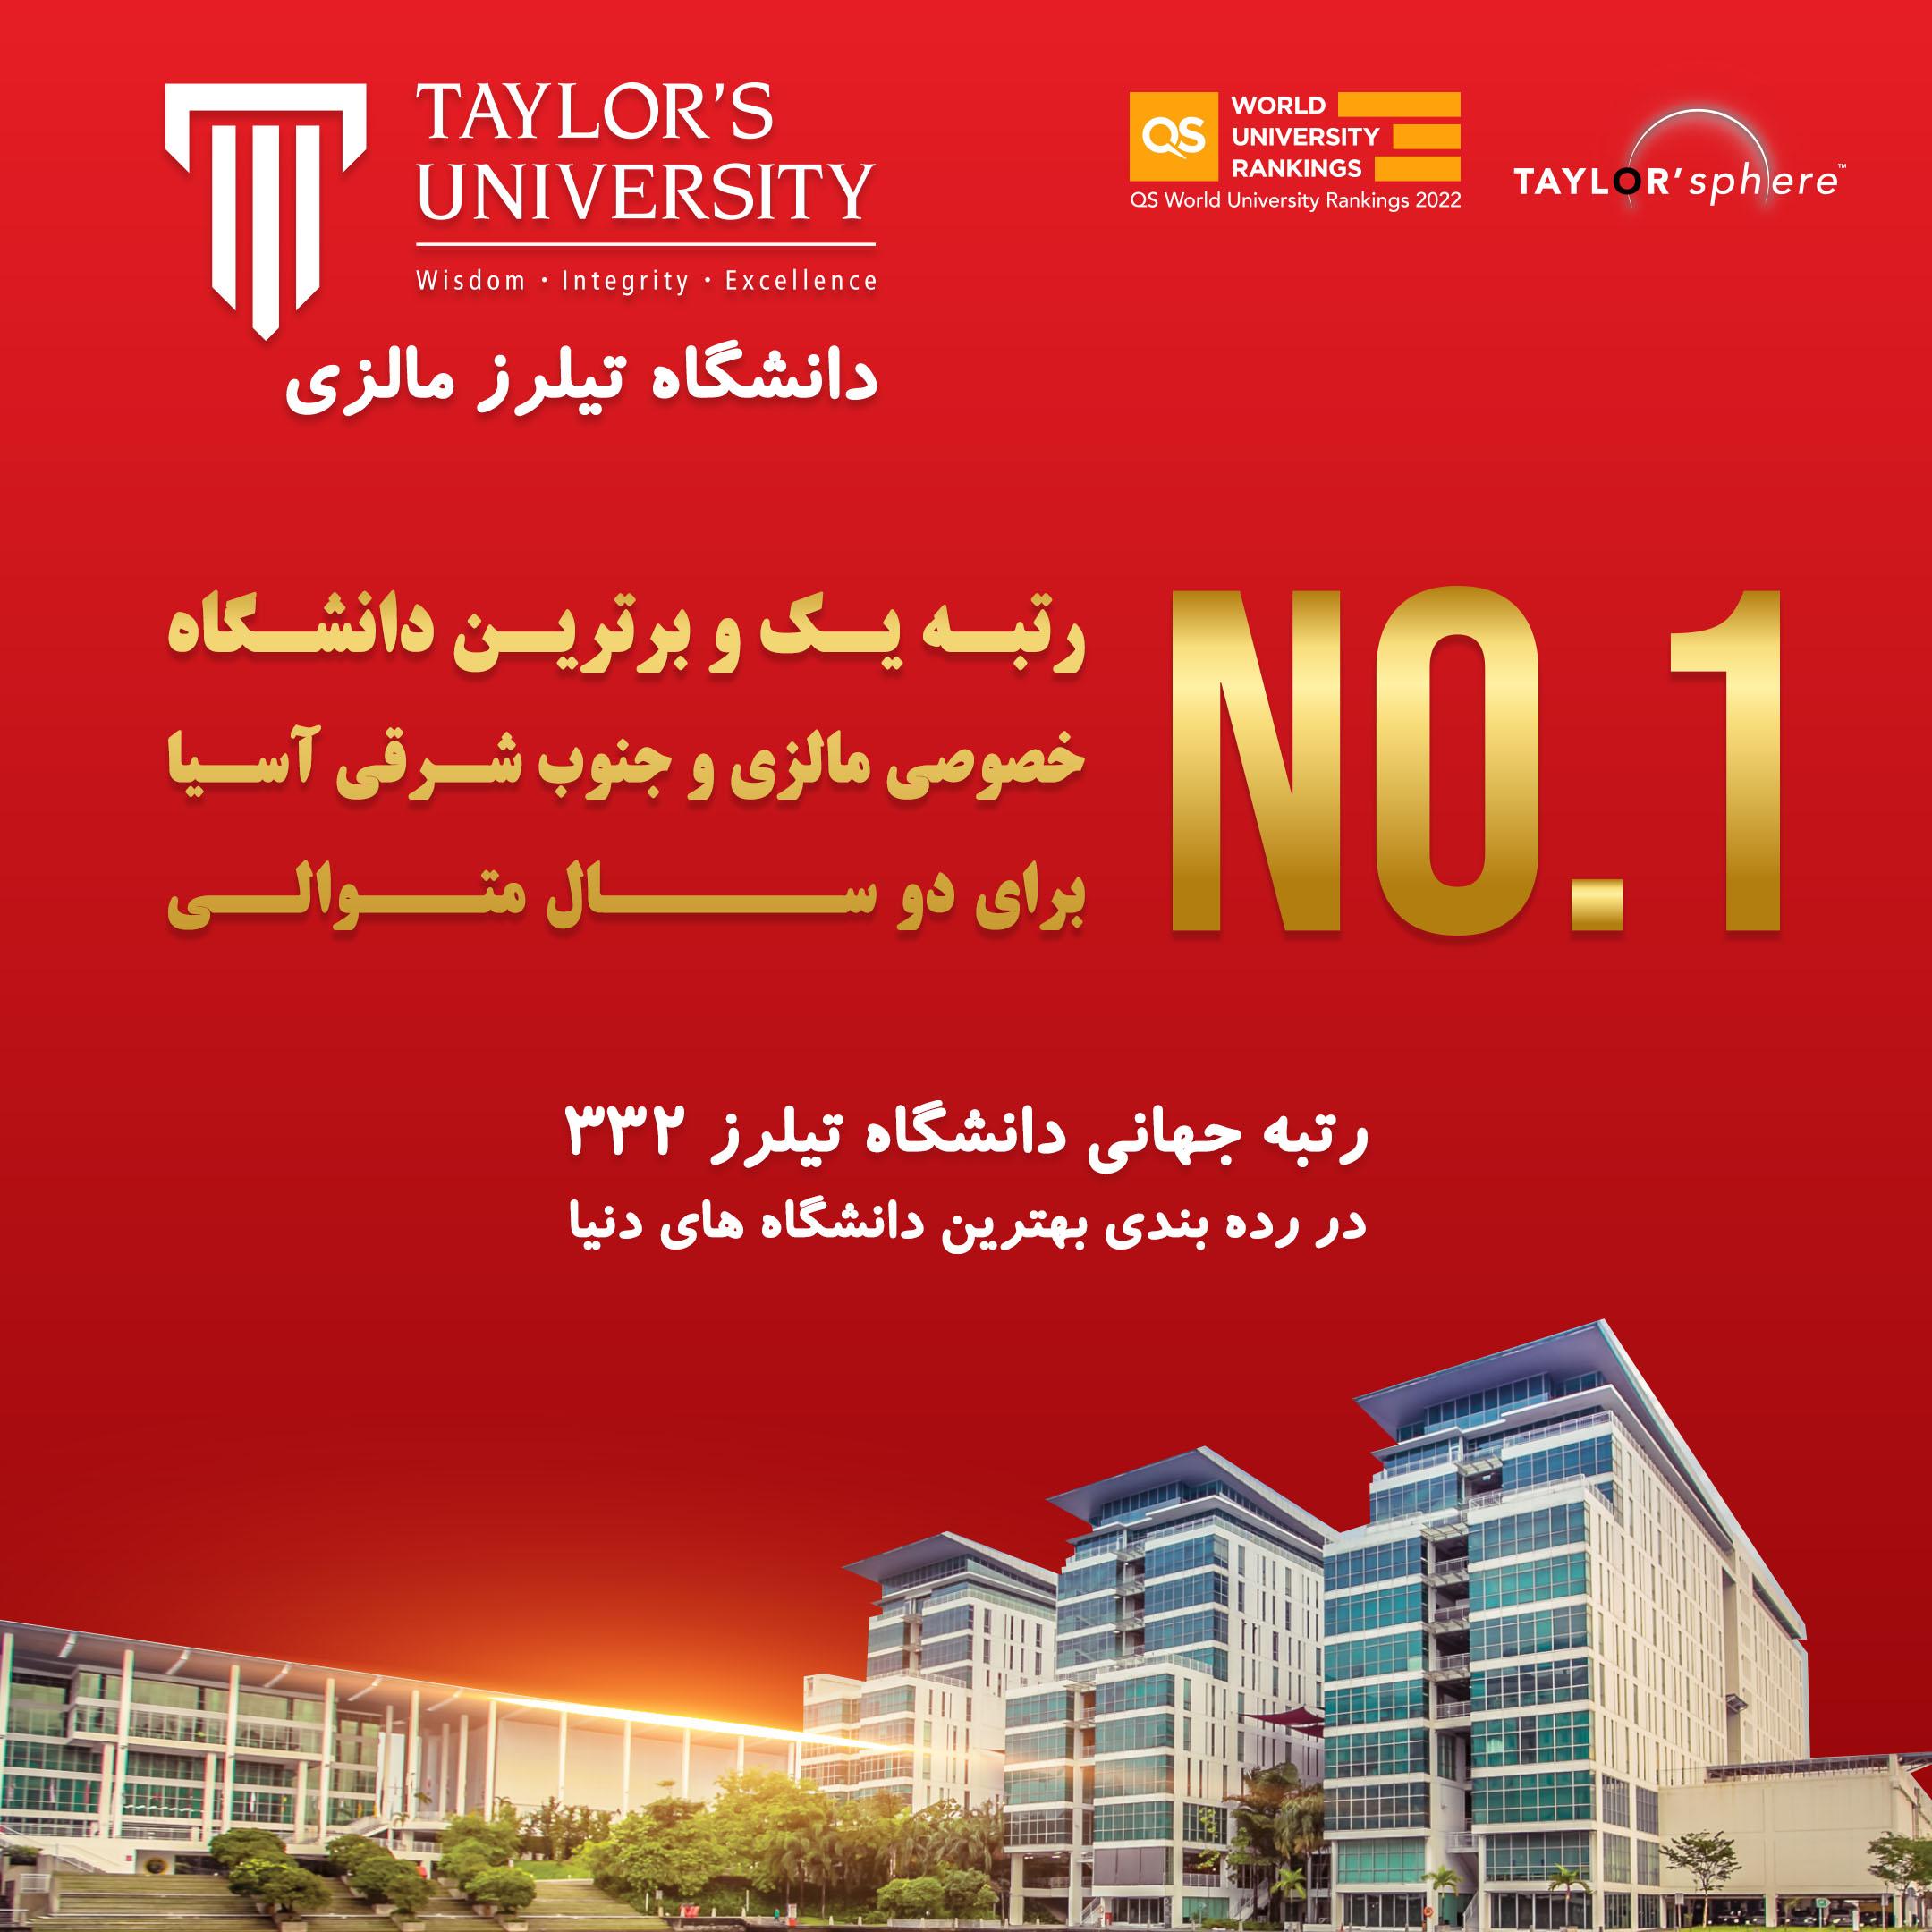 taylors ranking ads 2022 small size